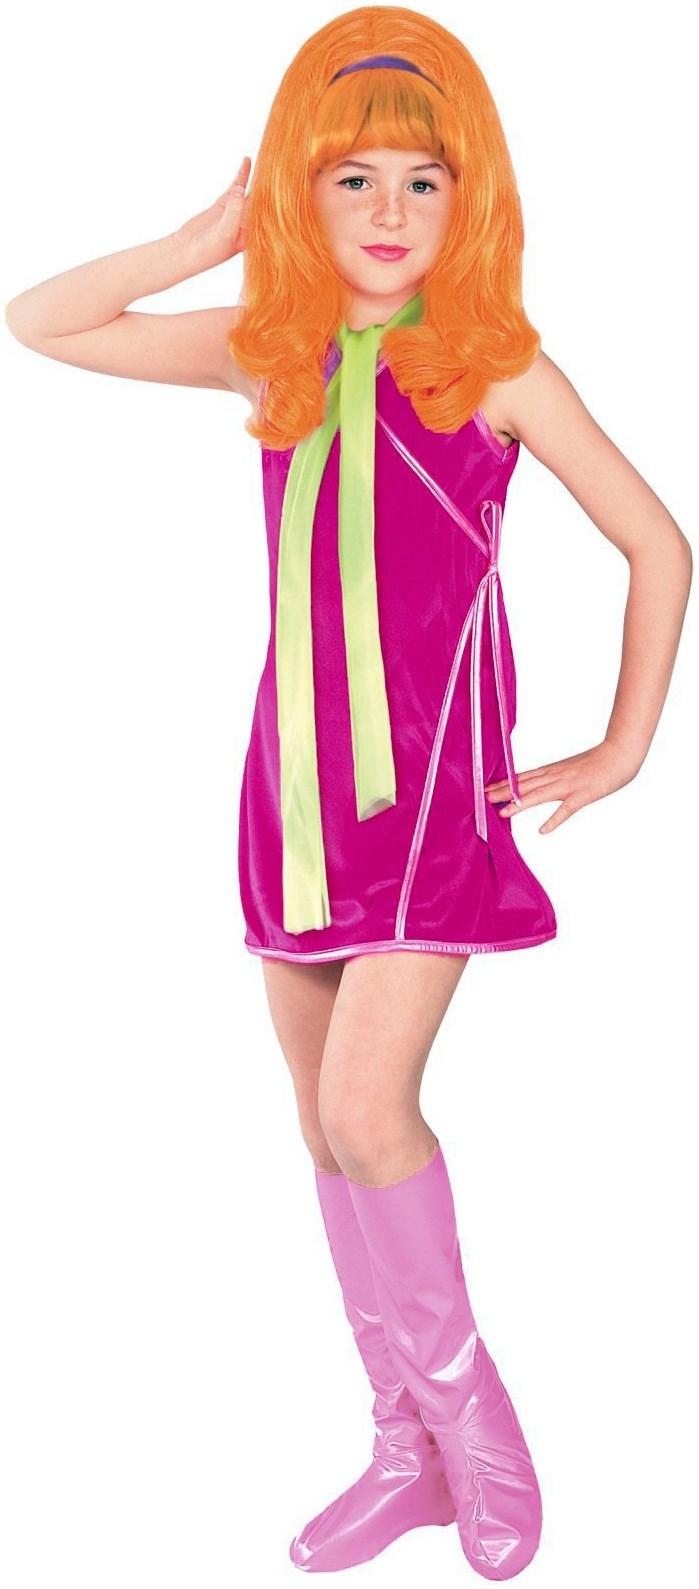 Scooby-Doo Daphne Child Costume   BirthdayExpress.com